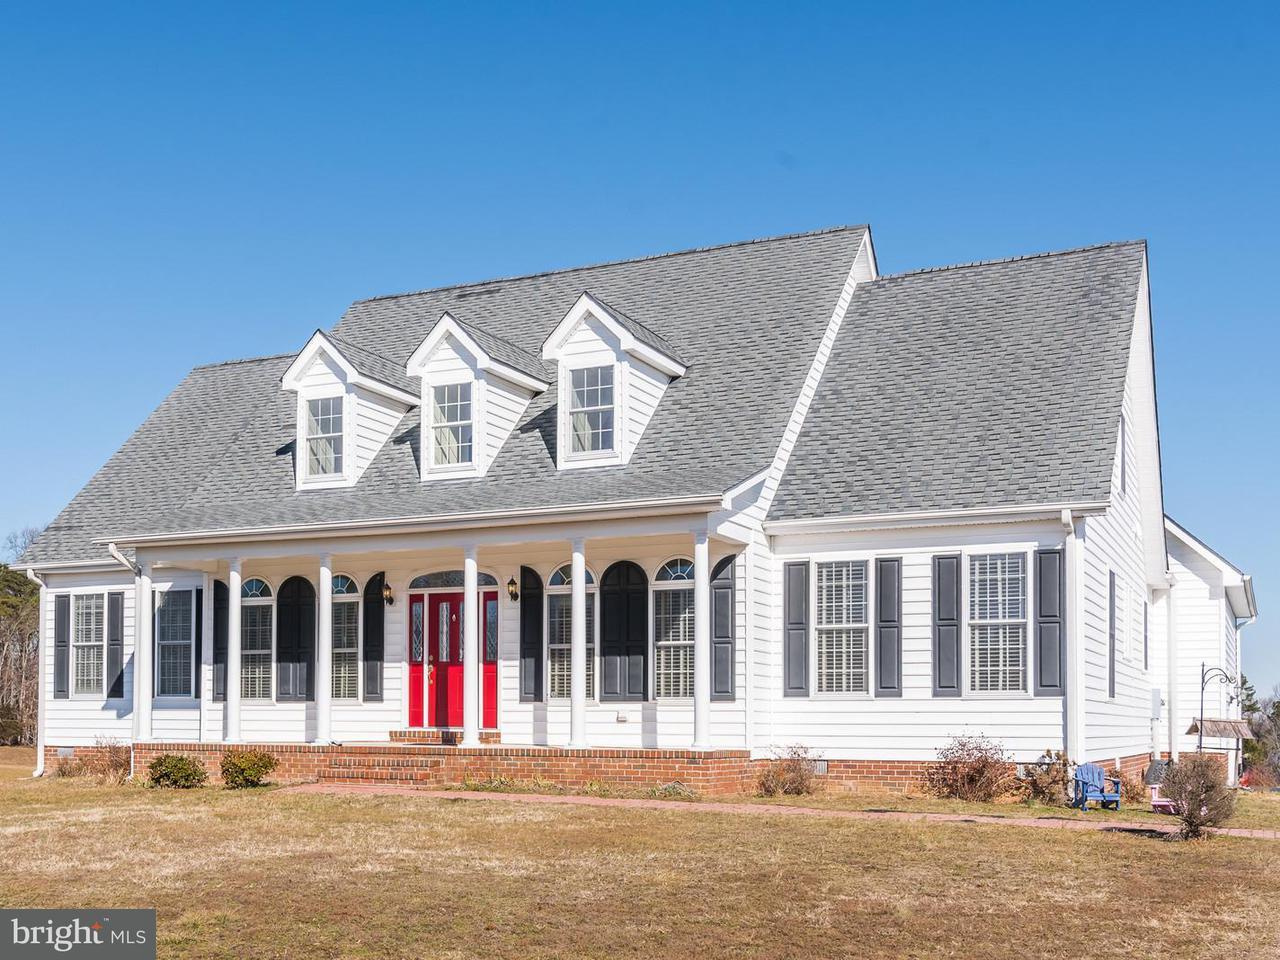 Single Family for Sale at 30286 Portobago Trl Port Royal, Virginia 22535 United States